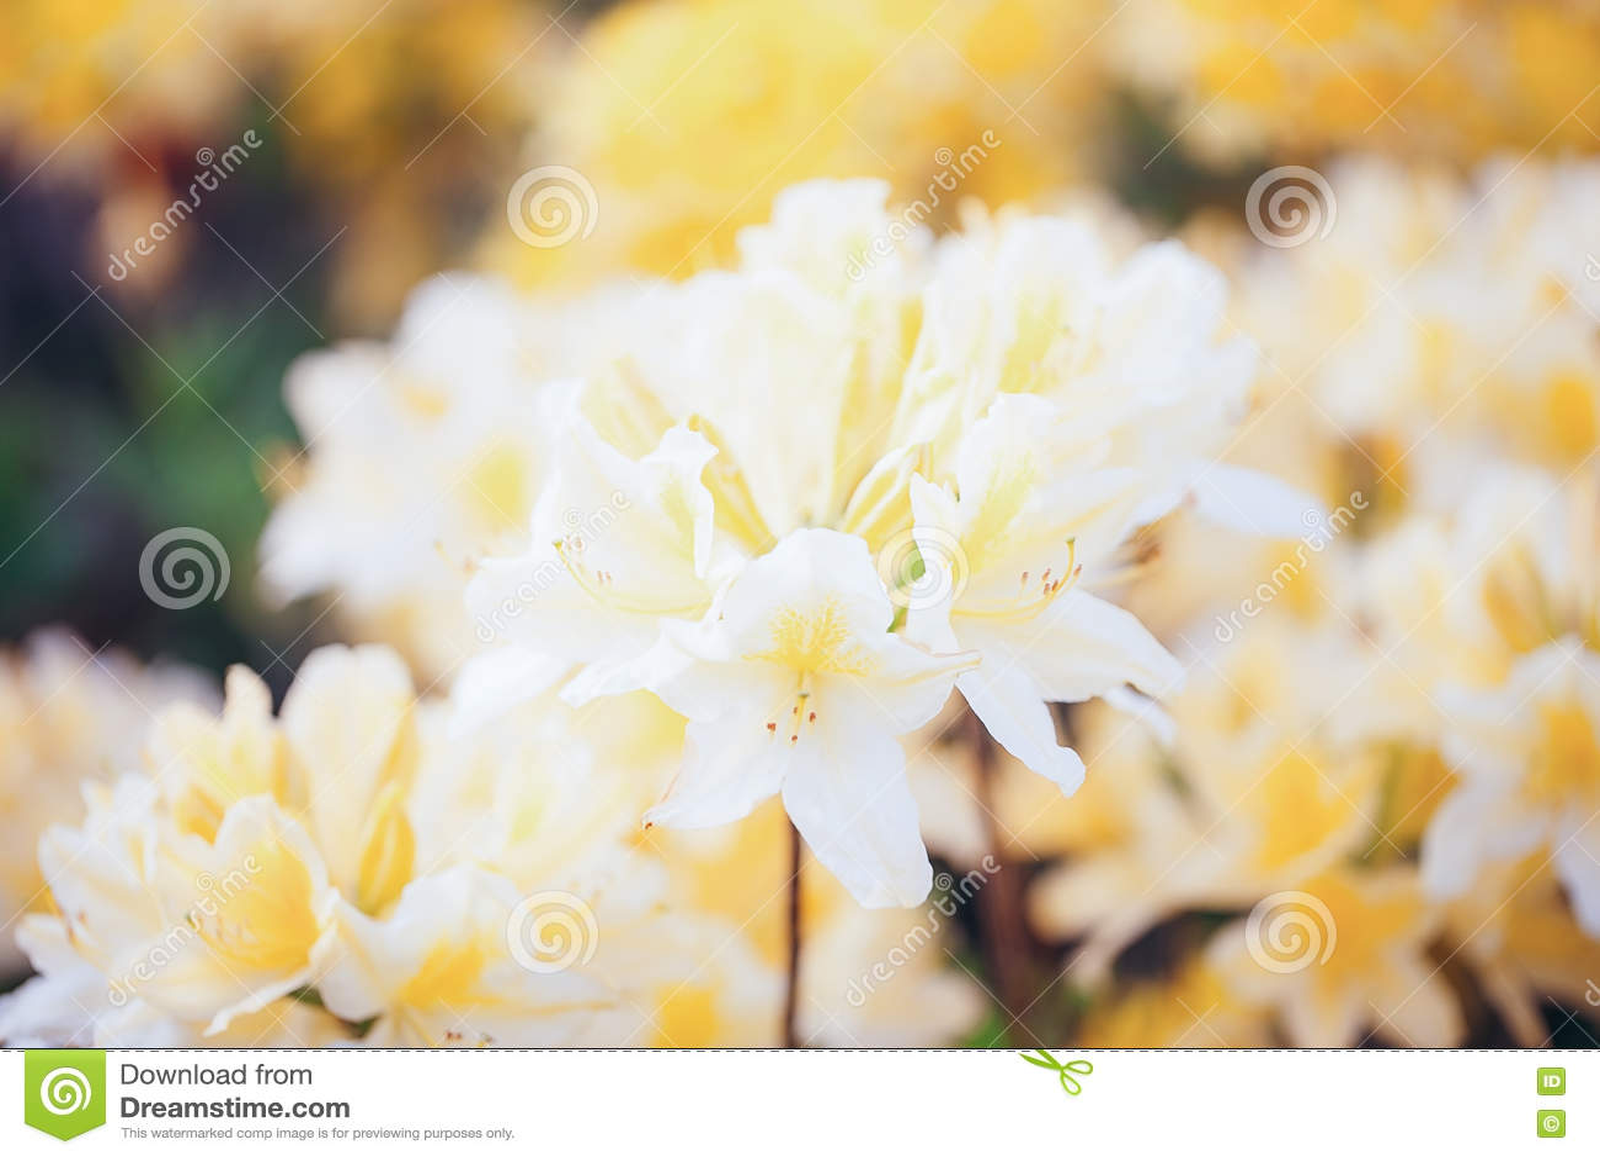 Pelargonium Geranium Group Bright Beautiful Cerise Yellow Flower